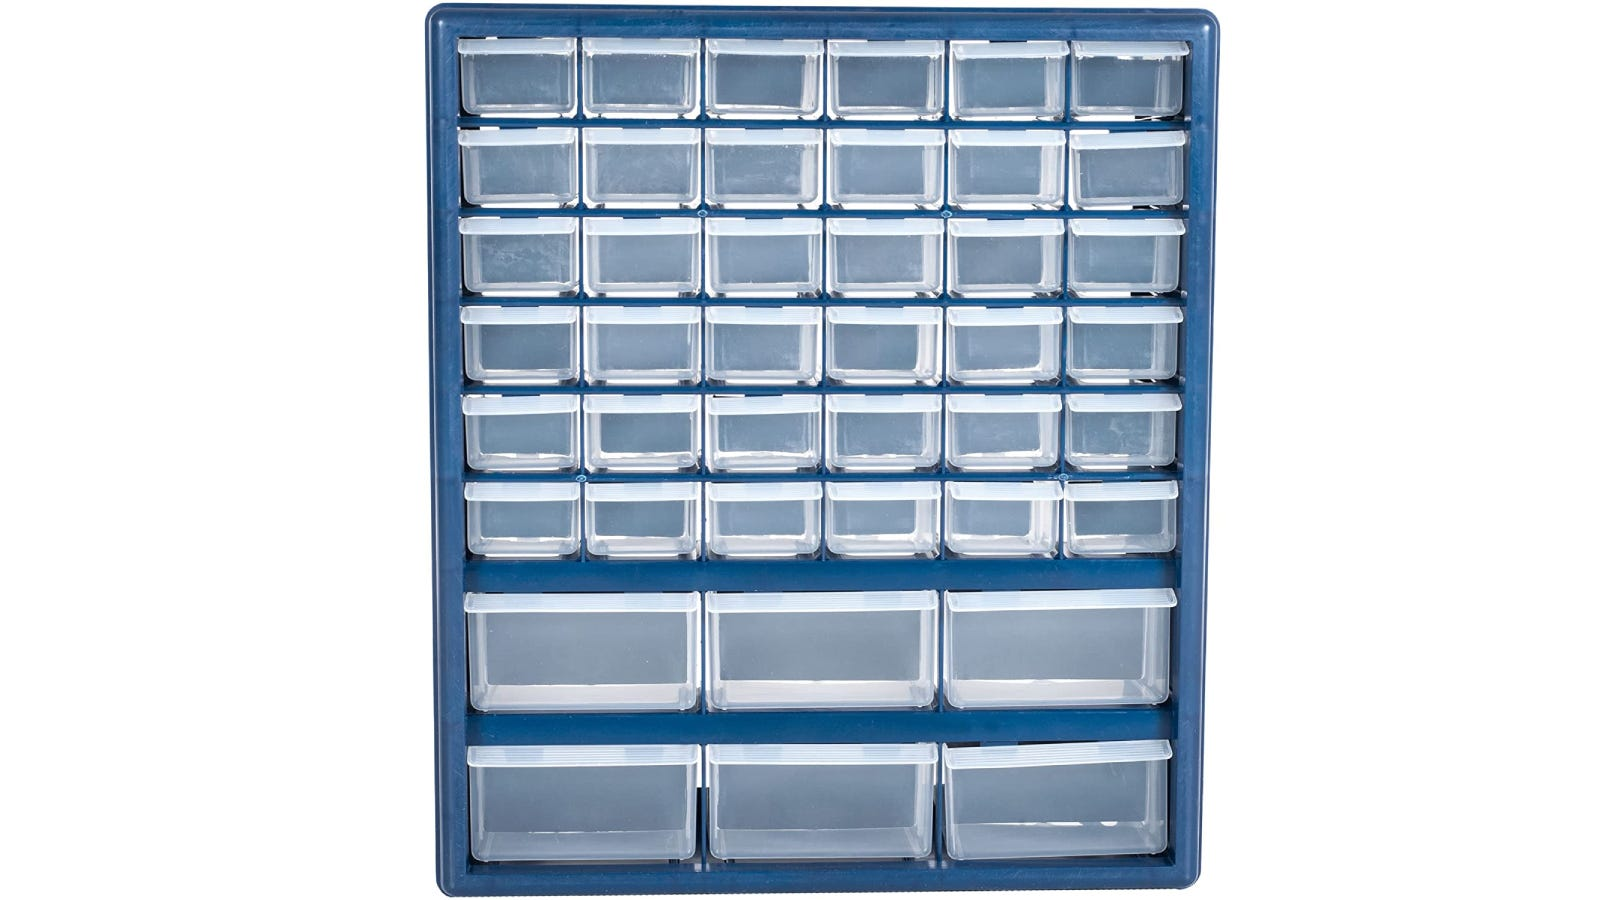 A blur teacher toolbox that has 42 drawers.